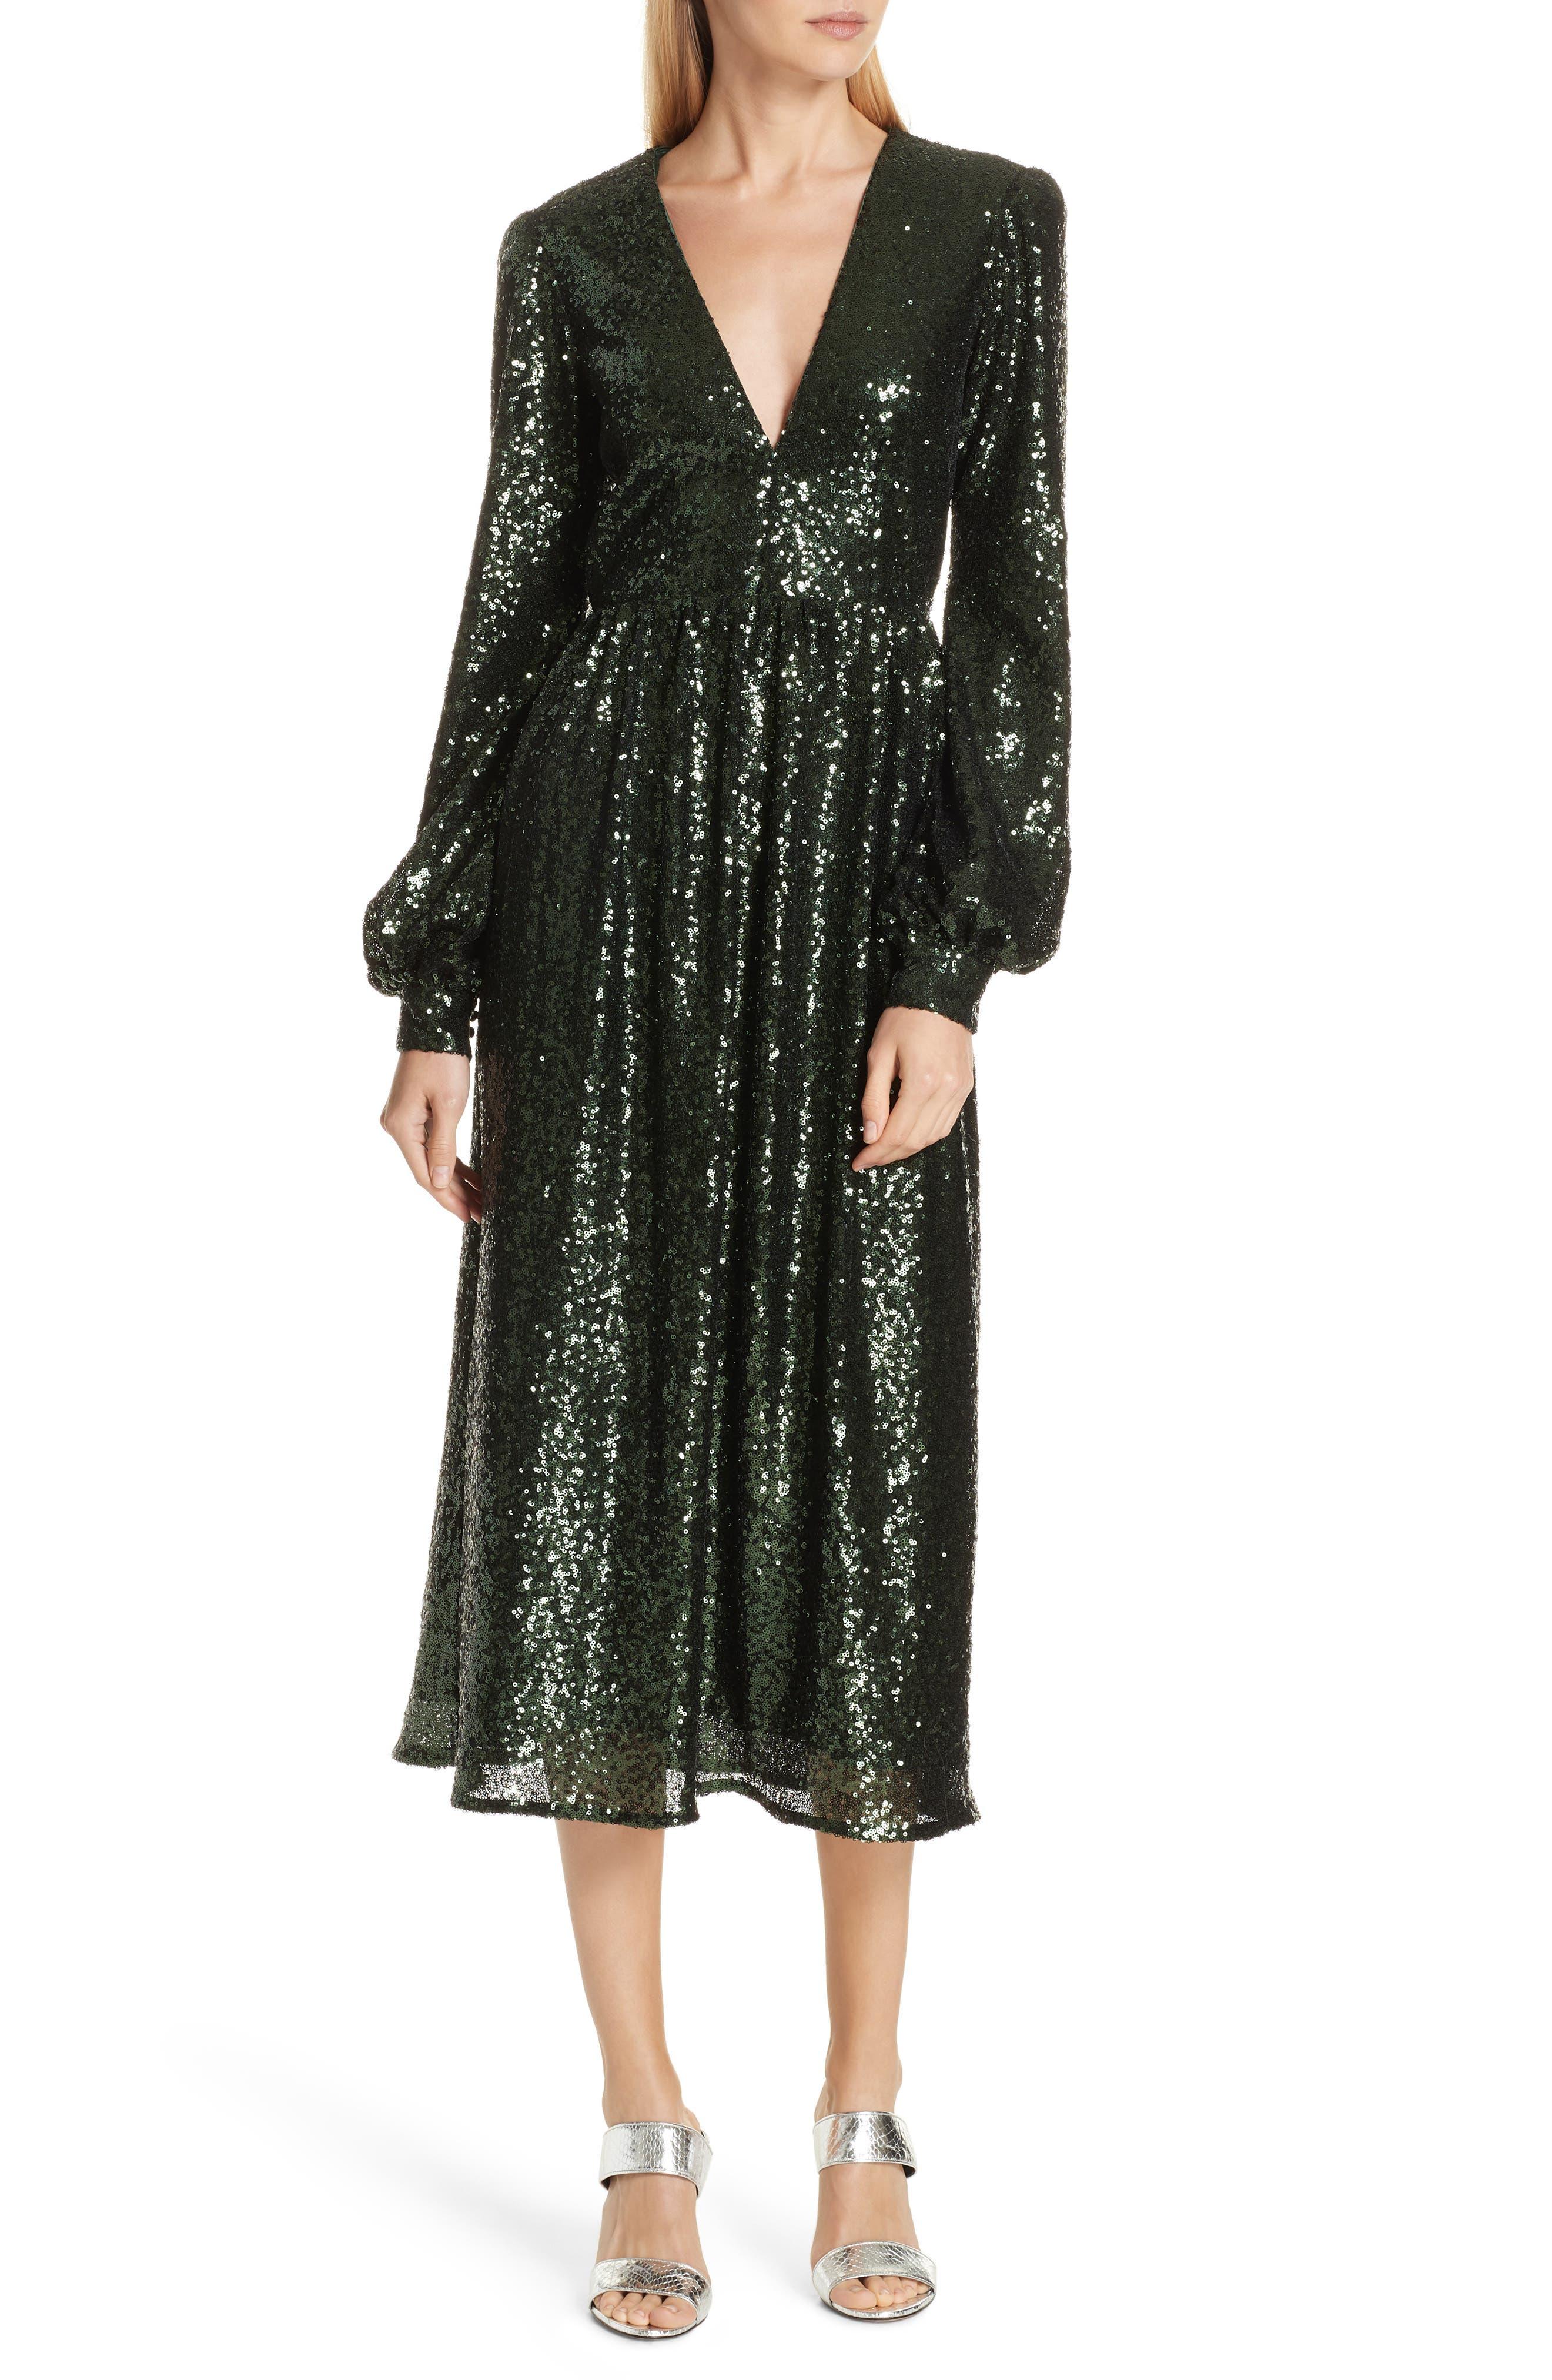 SALONI, Camille Sequin Midi Dress, Main thumbnail 1, color, DARK GREEN